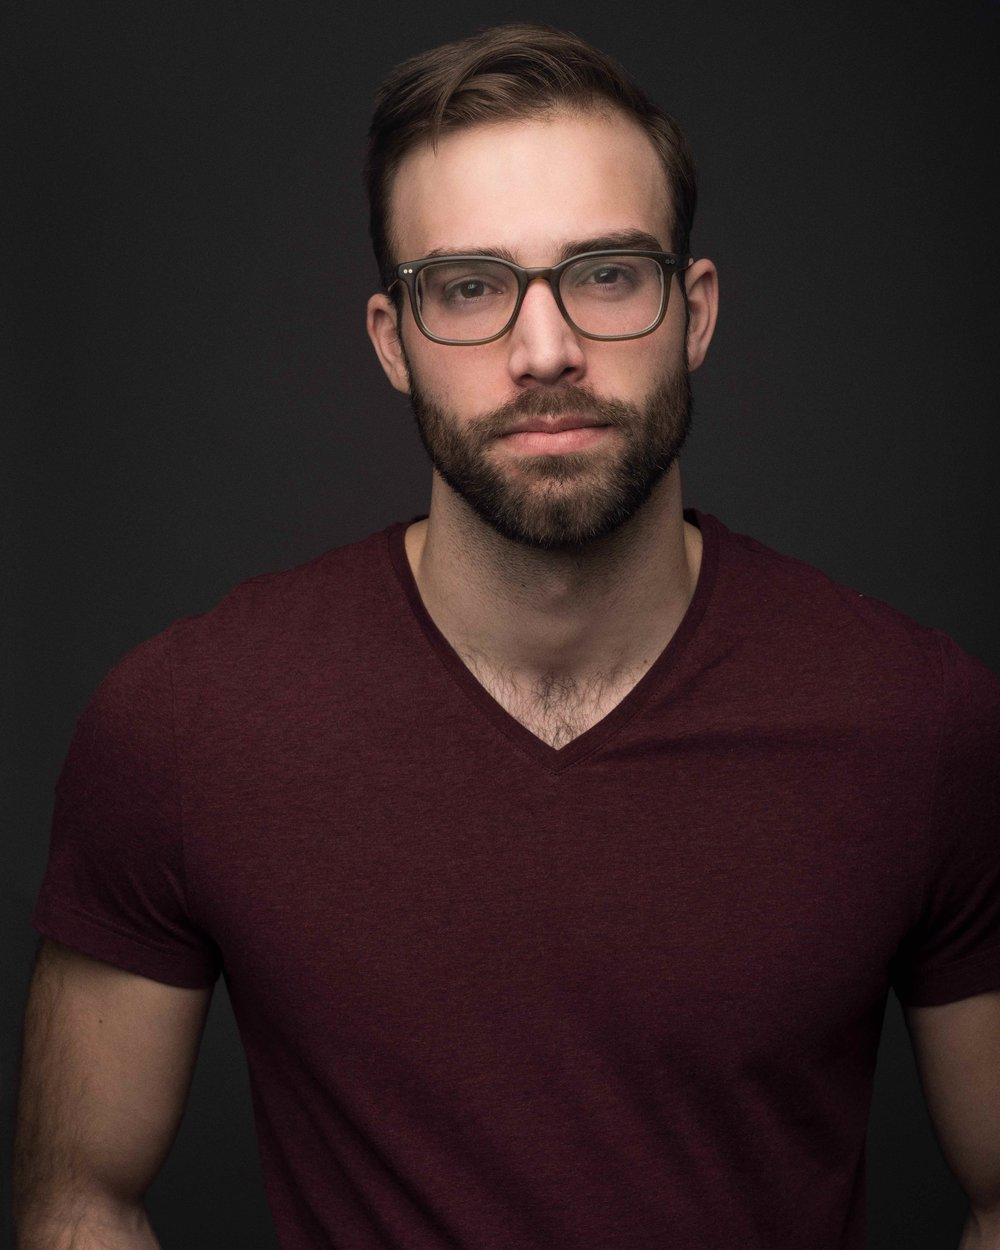 Dylan Palladino Beard Legit.jpg